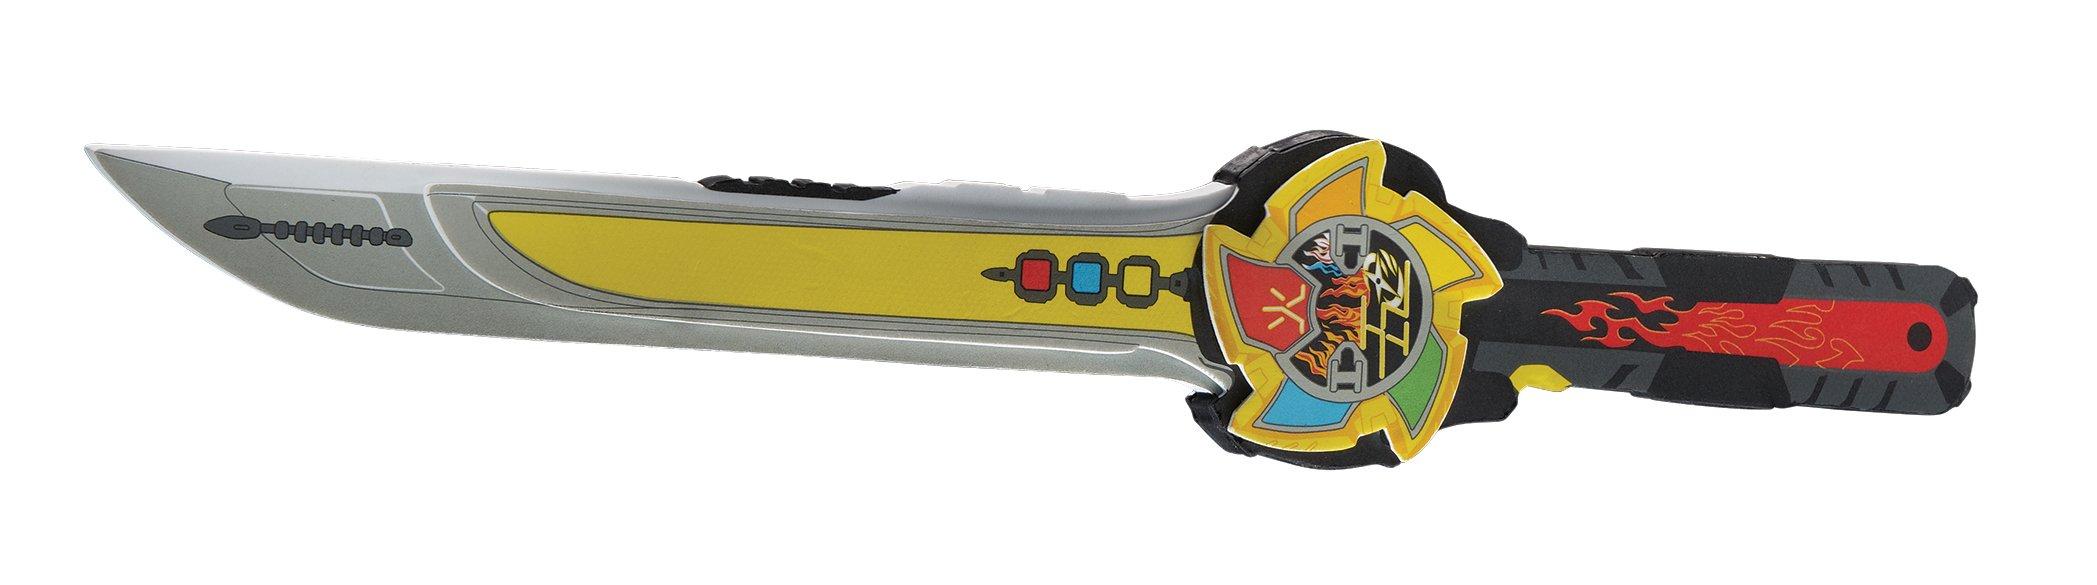 Power Rangers Ninja Steel Foam Ninja Sword